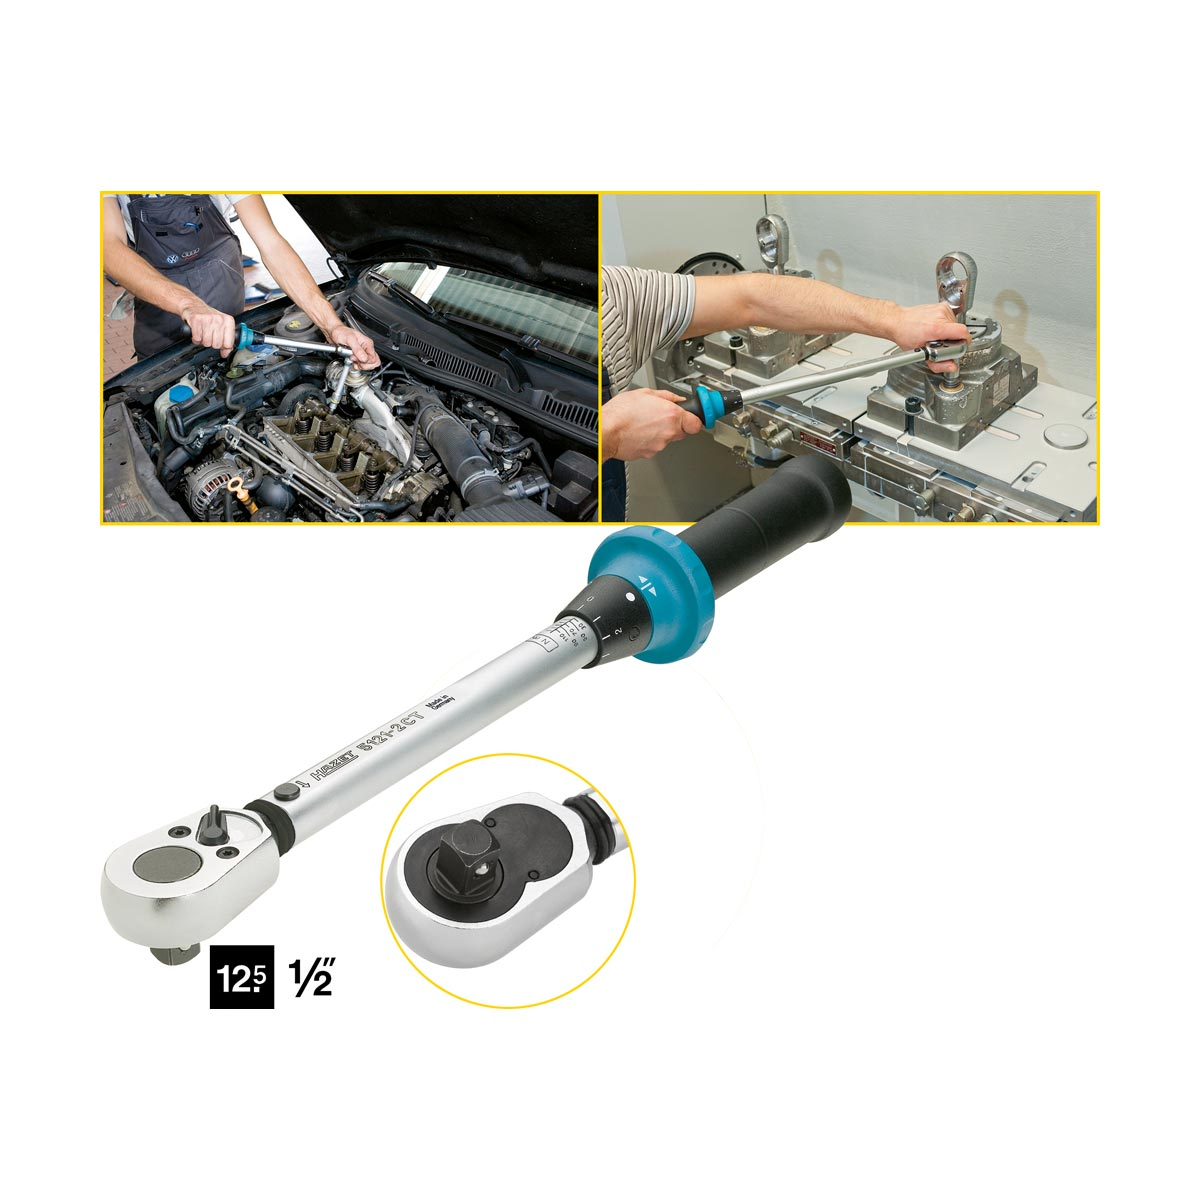 HAZET 5121-2CT Torque wrench with ratchet, 20 - 120 Nm